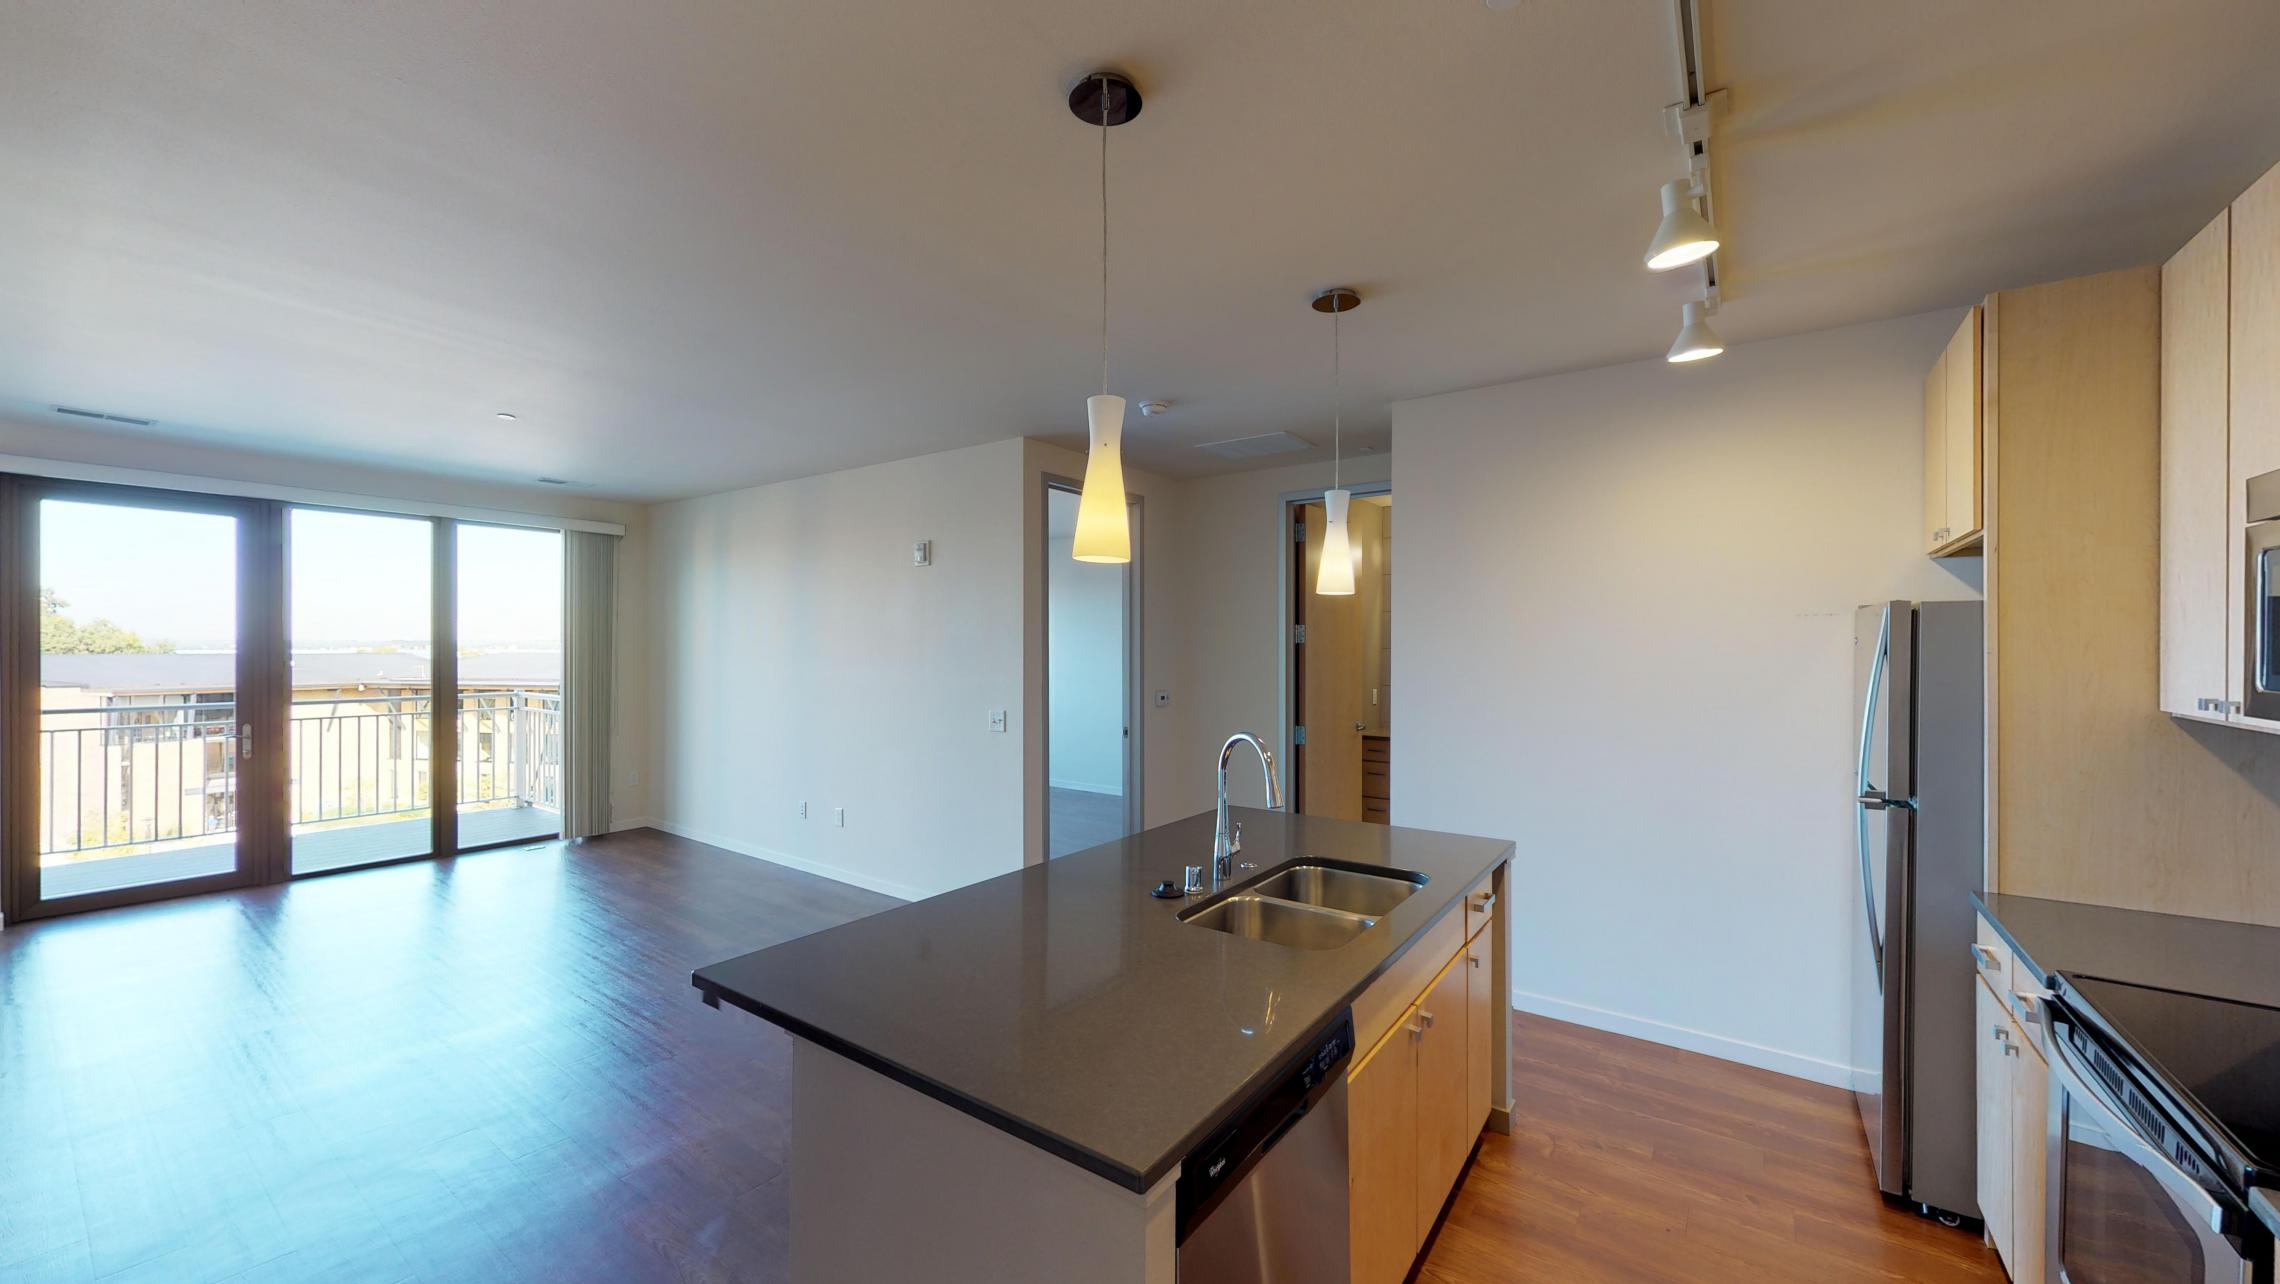 Nine-Line-Apartment-517-kitchen-appliances-moder-lake-view-downtown-captiol-madison-lifestyle-city.jpg